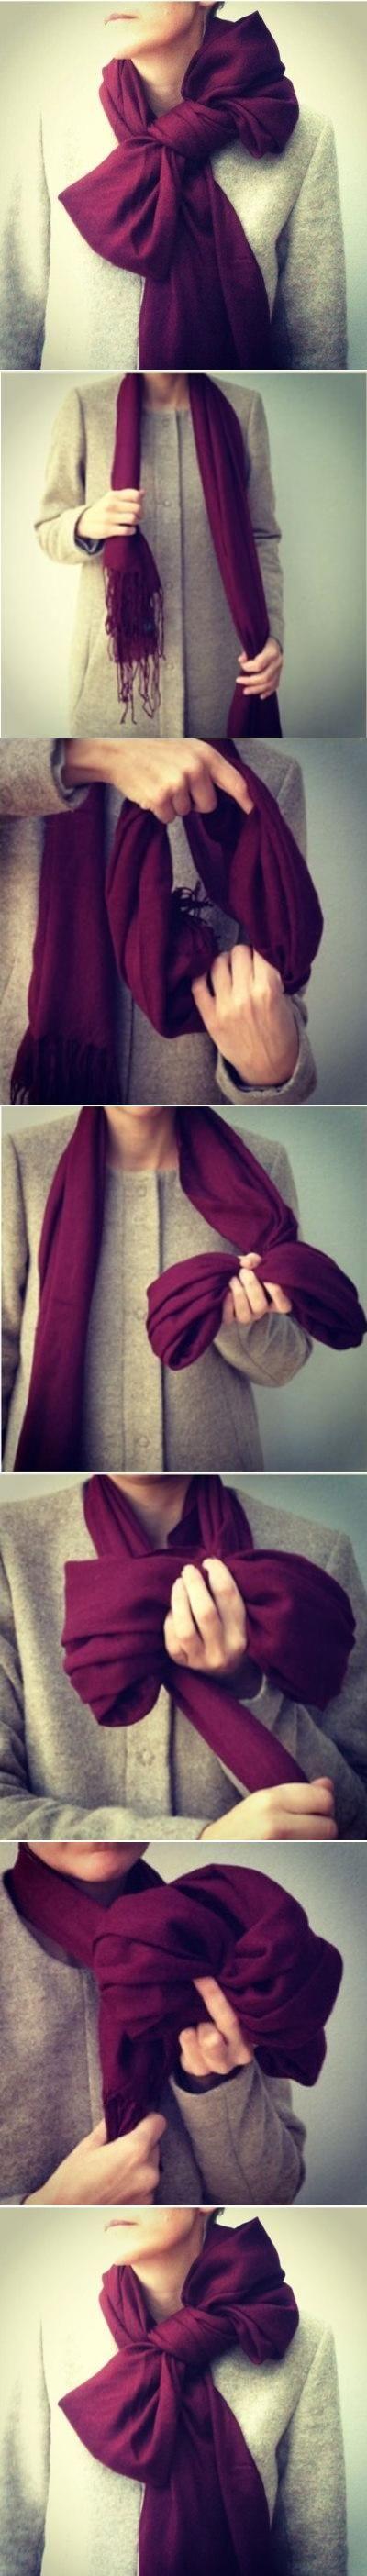 bufanda moño